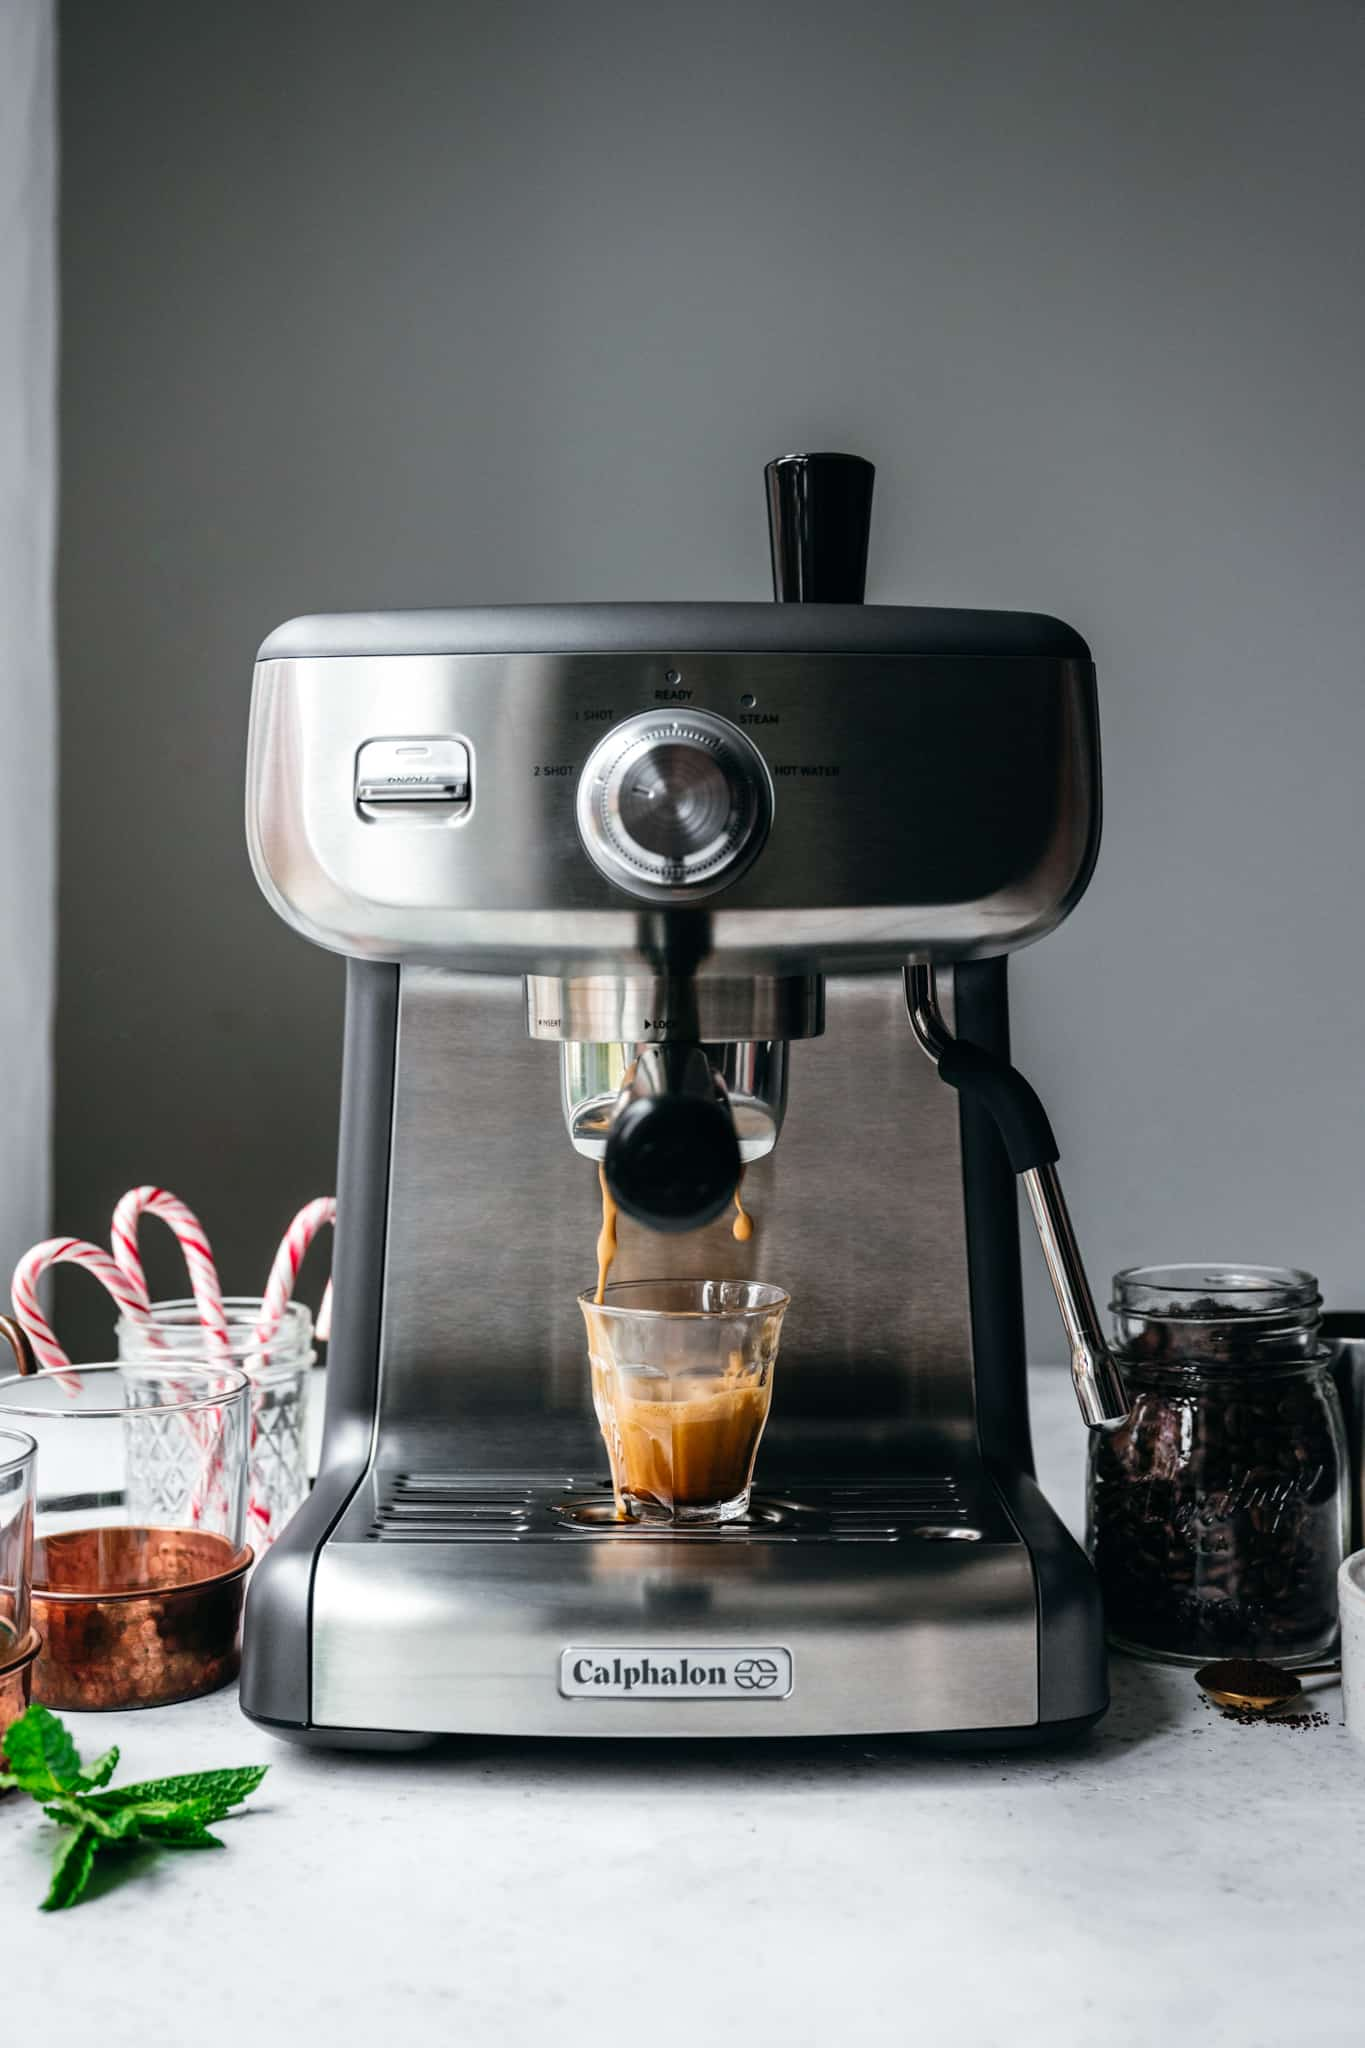 Action shot of espresso going into small mug